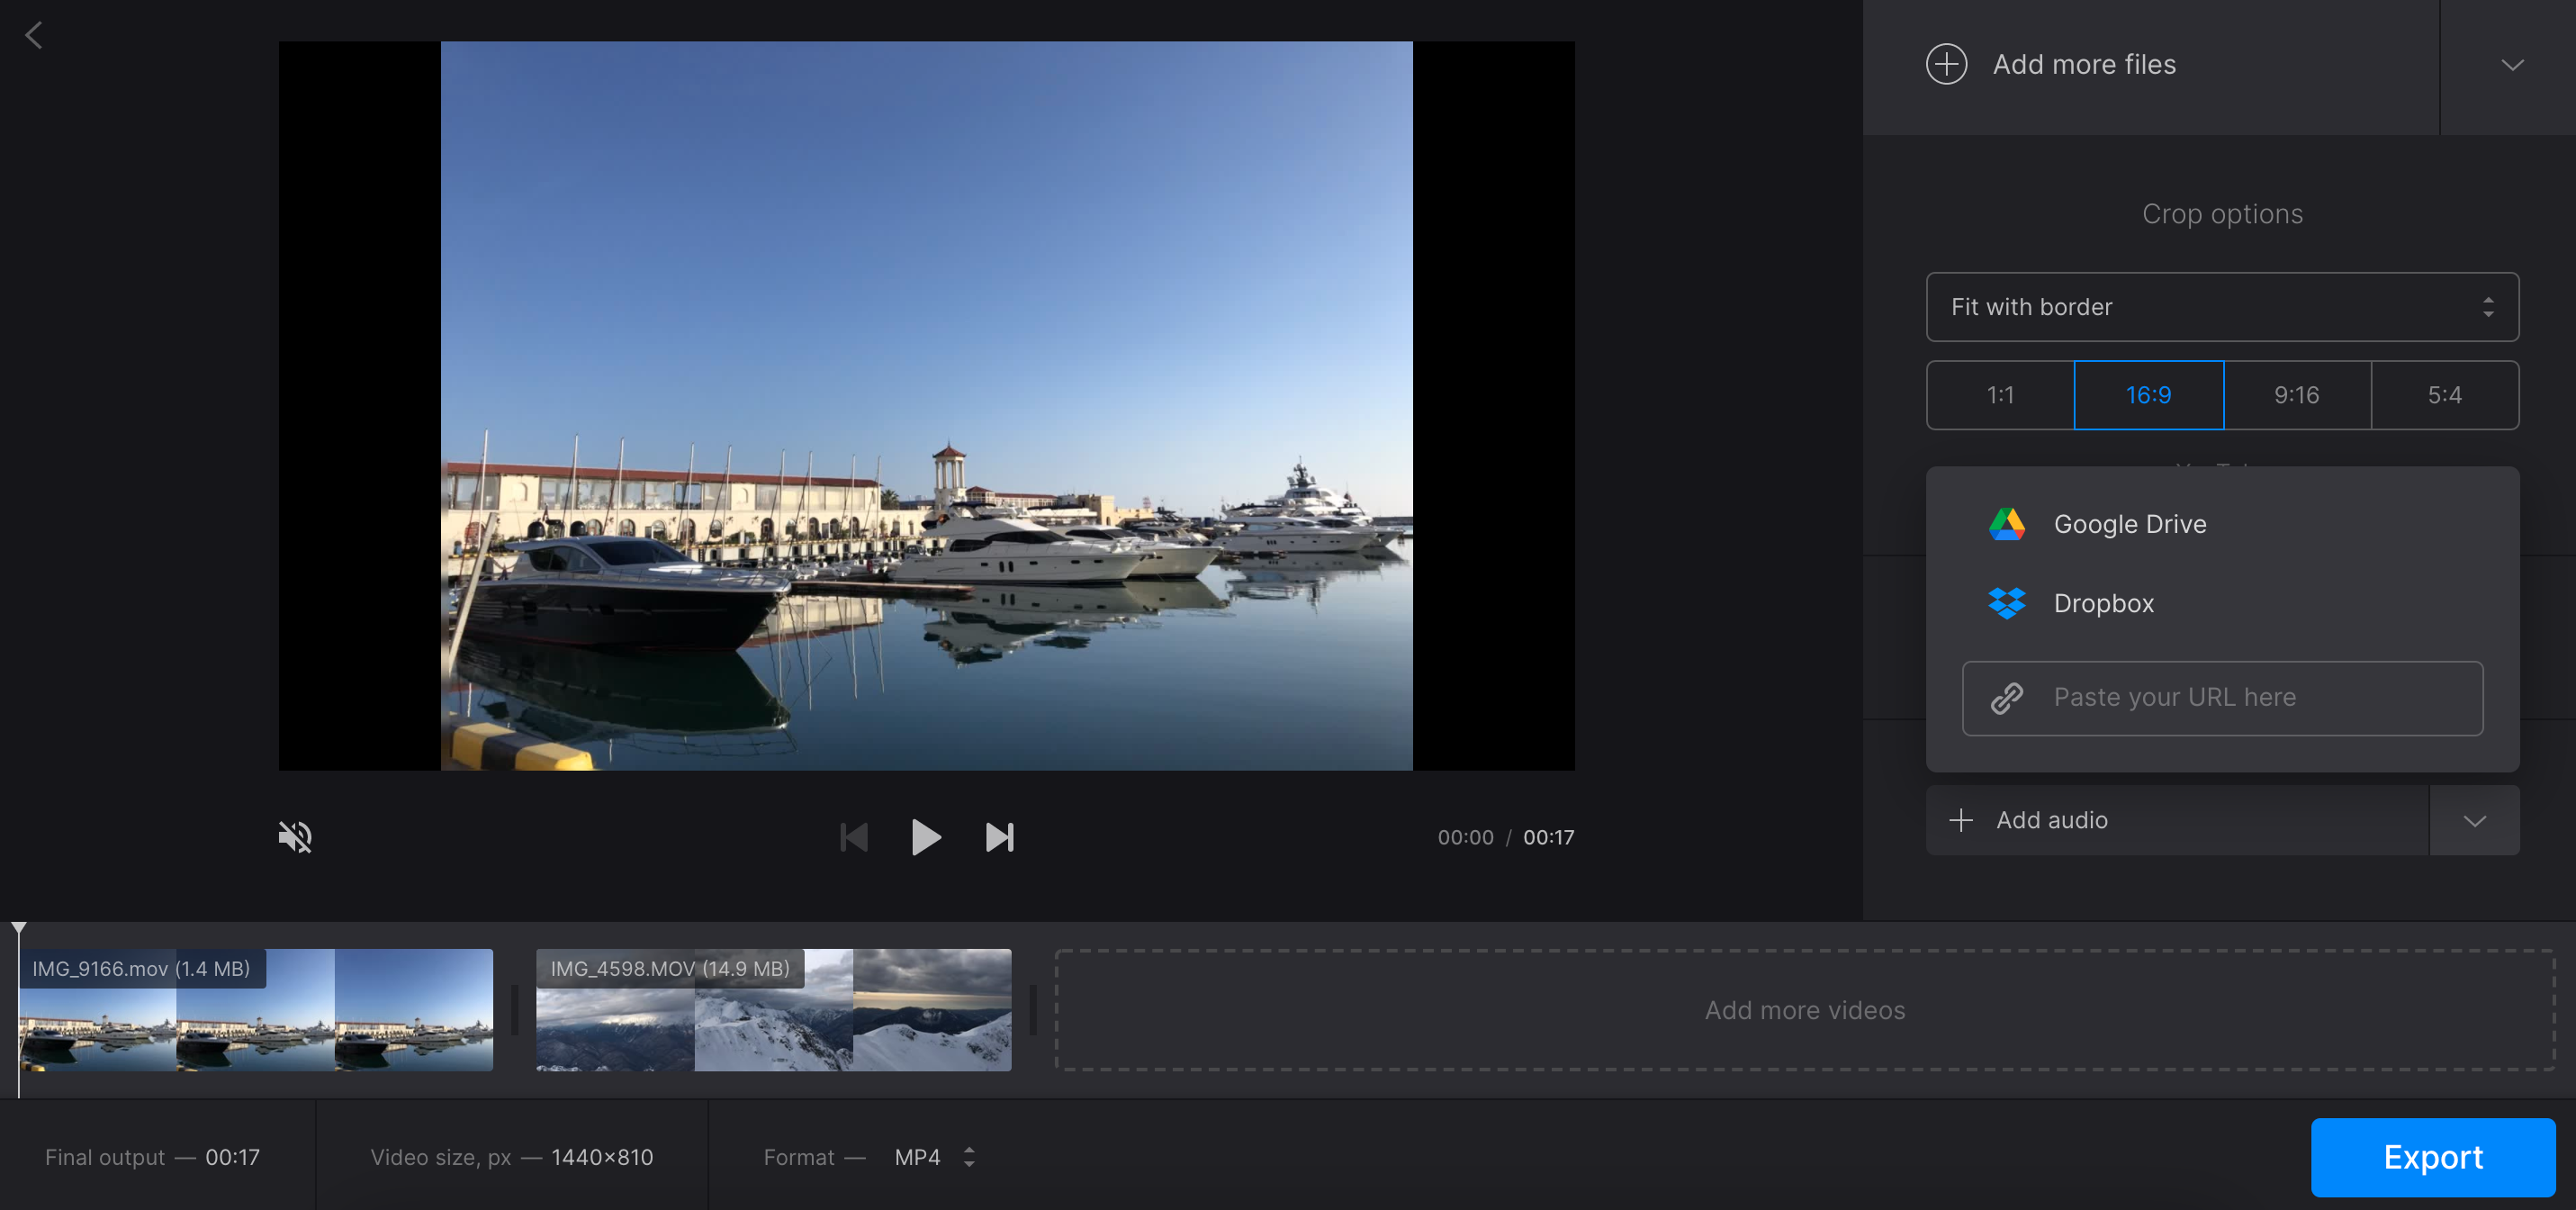 Upload audio for YouTube